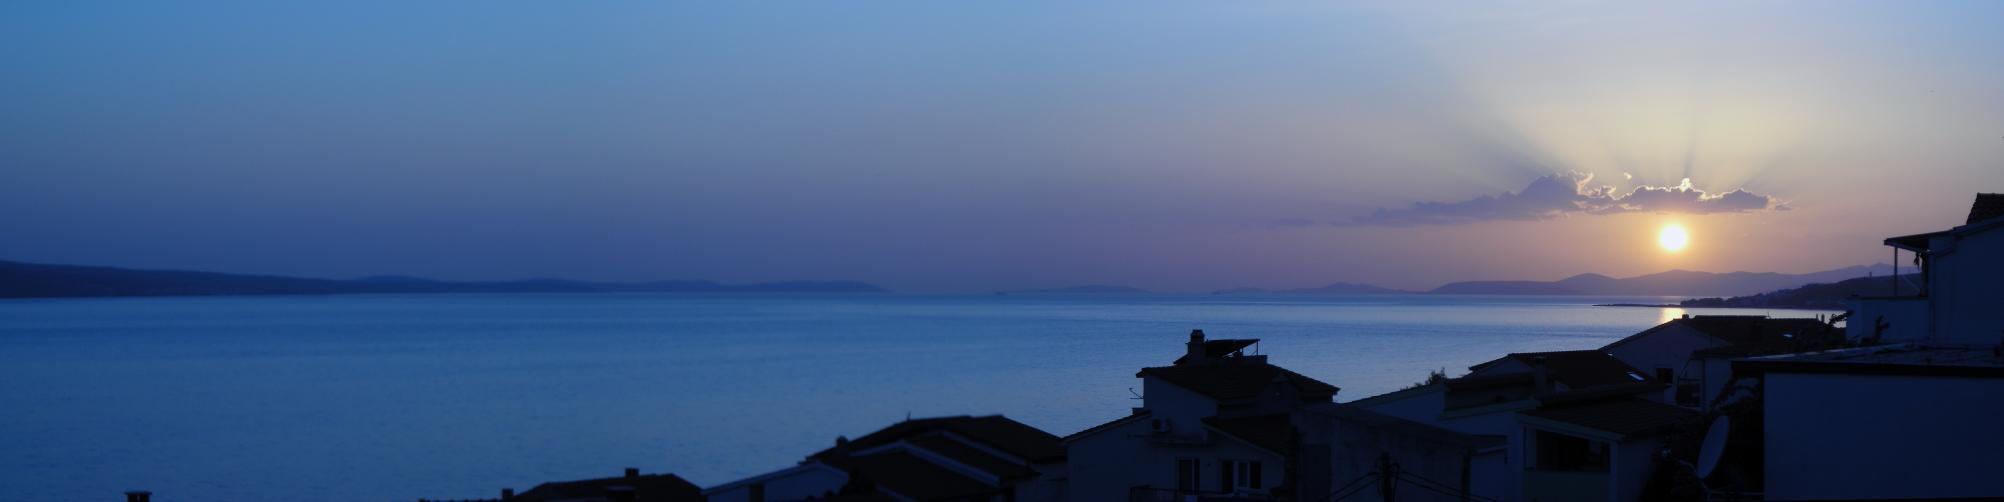 http://fc07.deviantart.net/fs71/f/2011/163/5/f/sunset_in_croatia_by_vergilius3-d3ip4jw.jpg